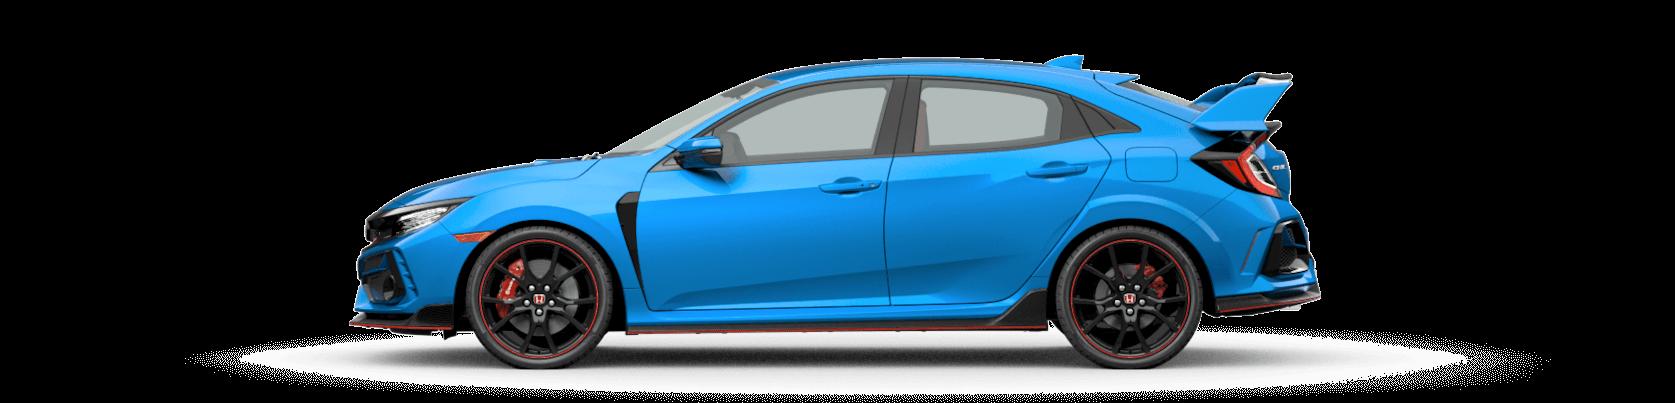 Honda Civic Type R Awards Jellybean